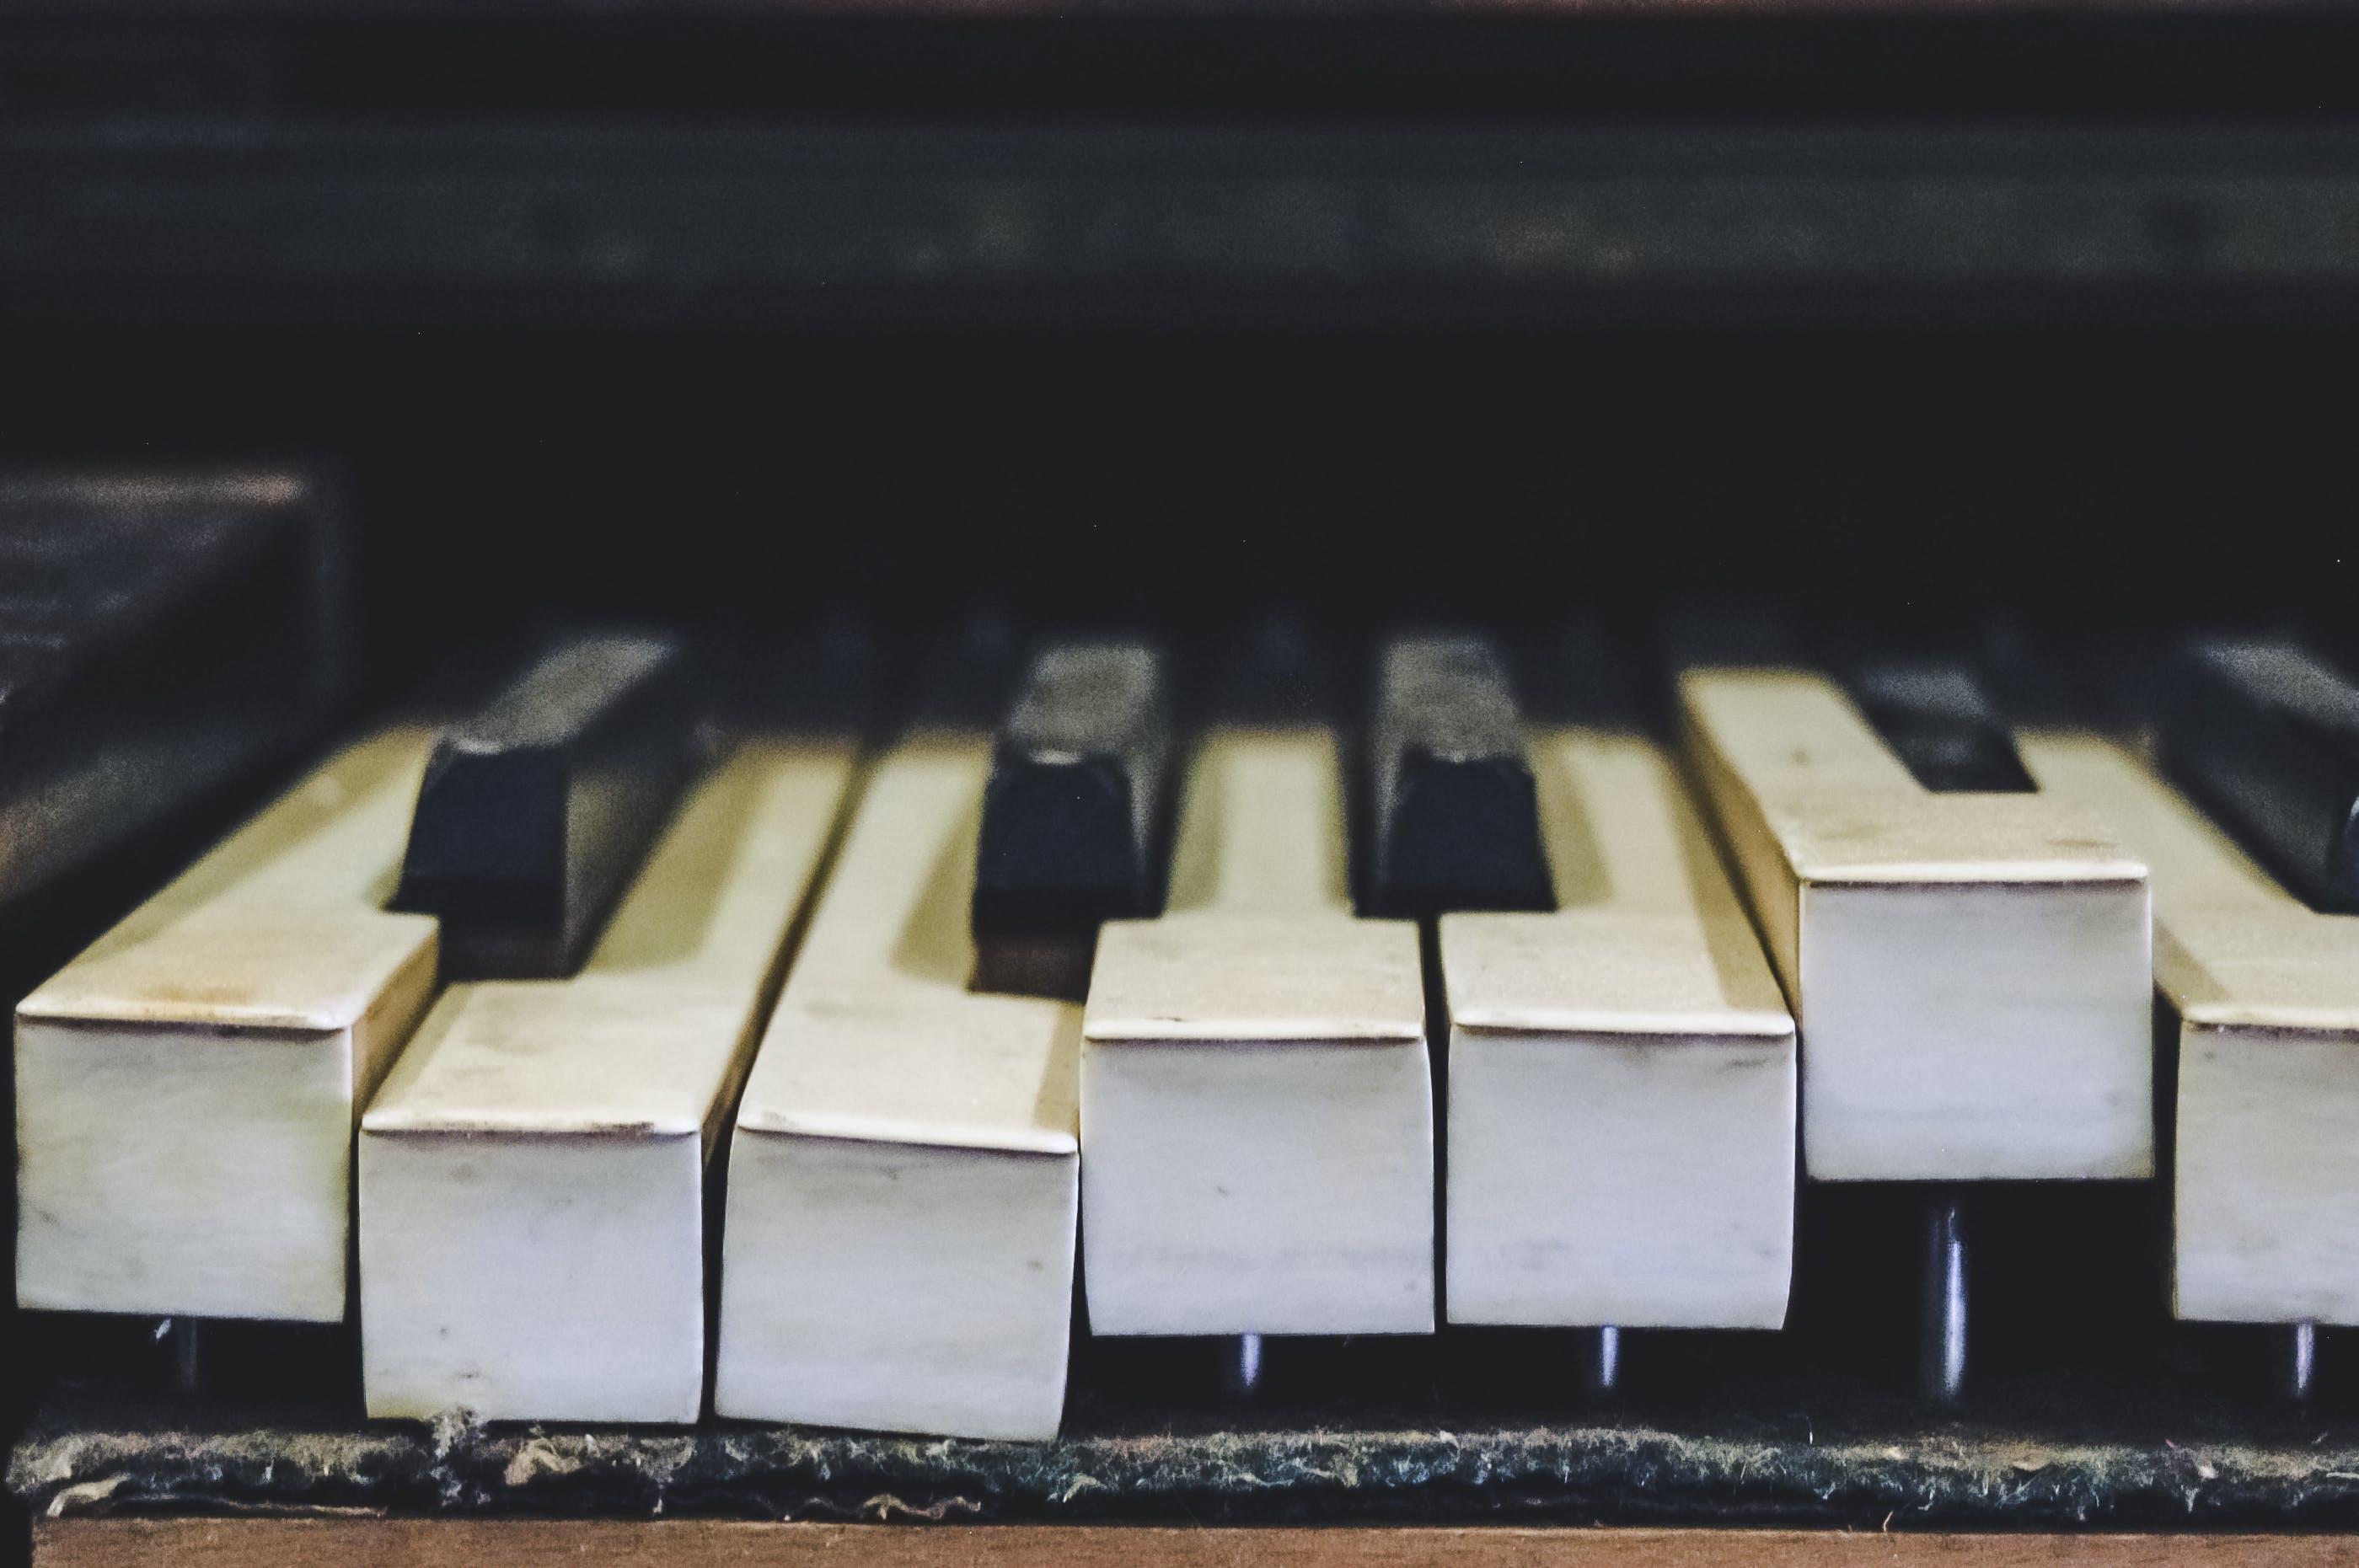 Gratis lagerfoto af klavertangenter, lukke op, musikinstrument, tastatur